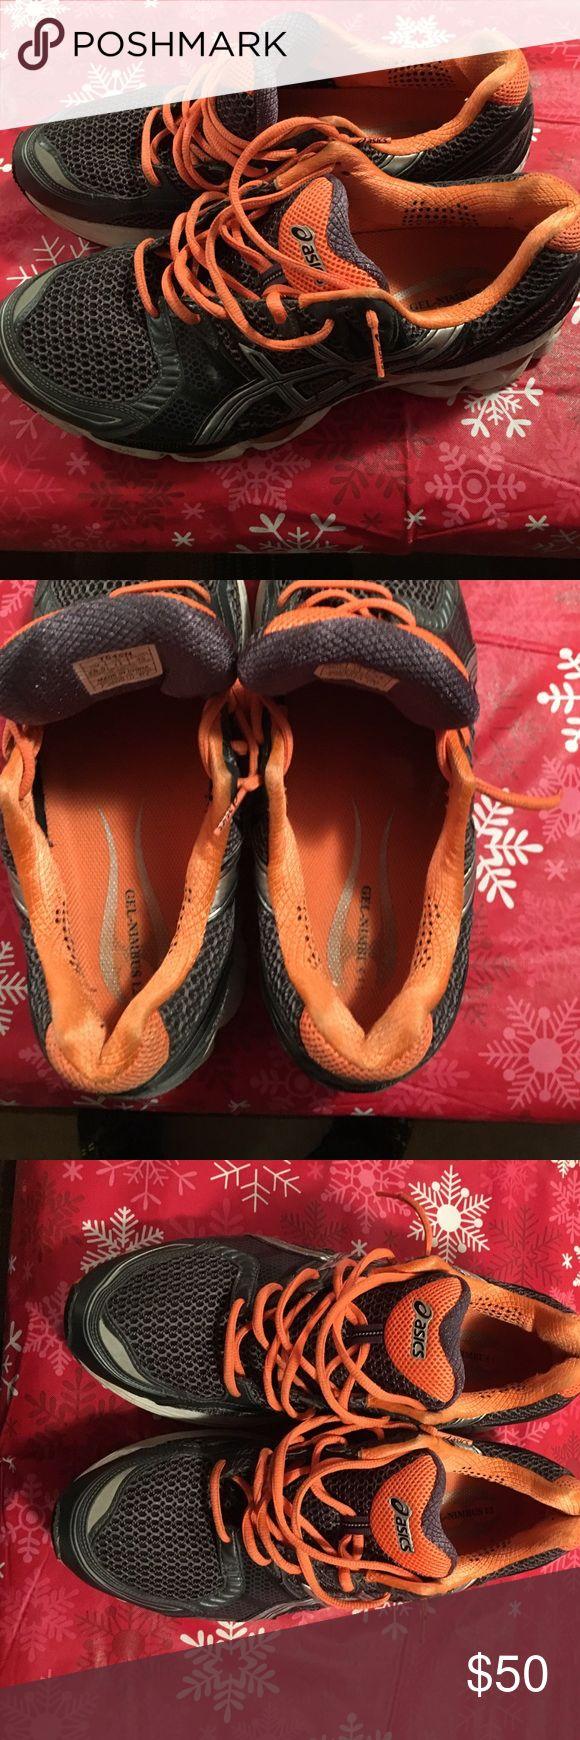 Men's Asics Men's Asics Gel-Nimbus 12 Asics Shoes Sneakers